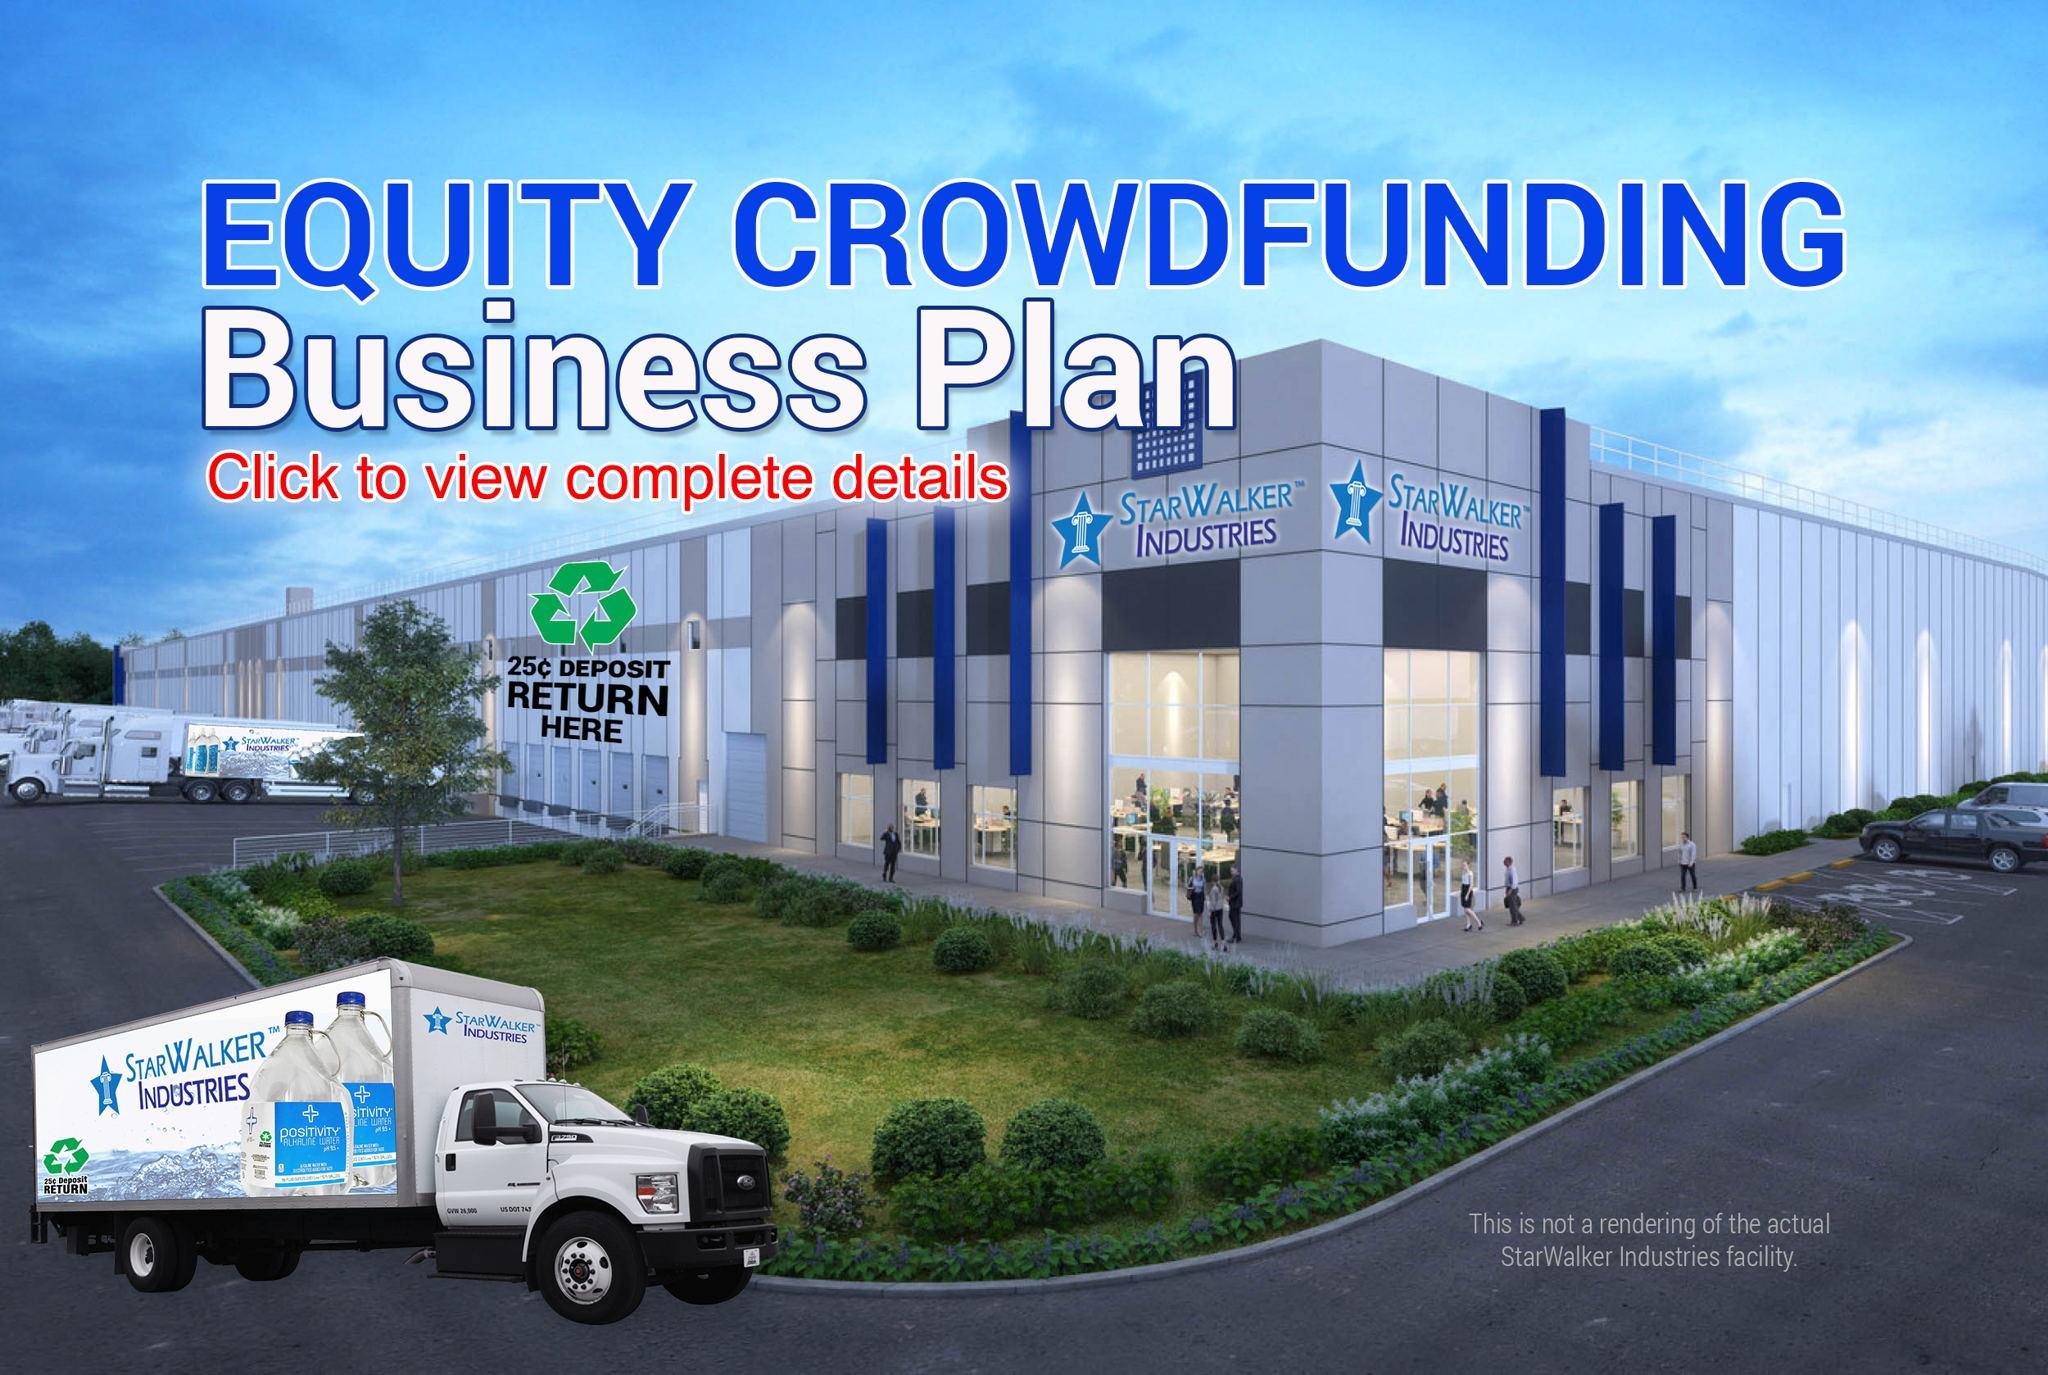 StarWalker Industries complete business plan details